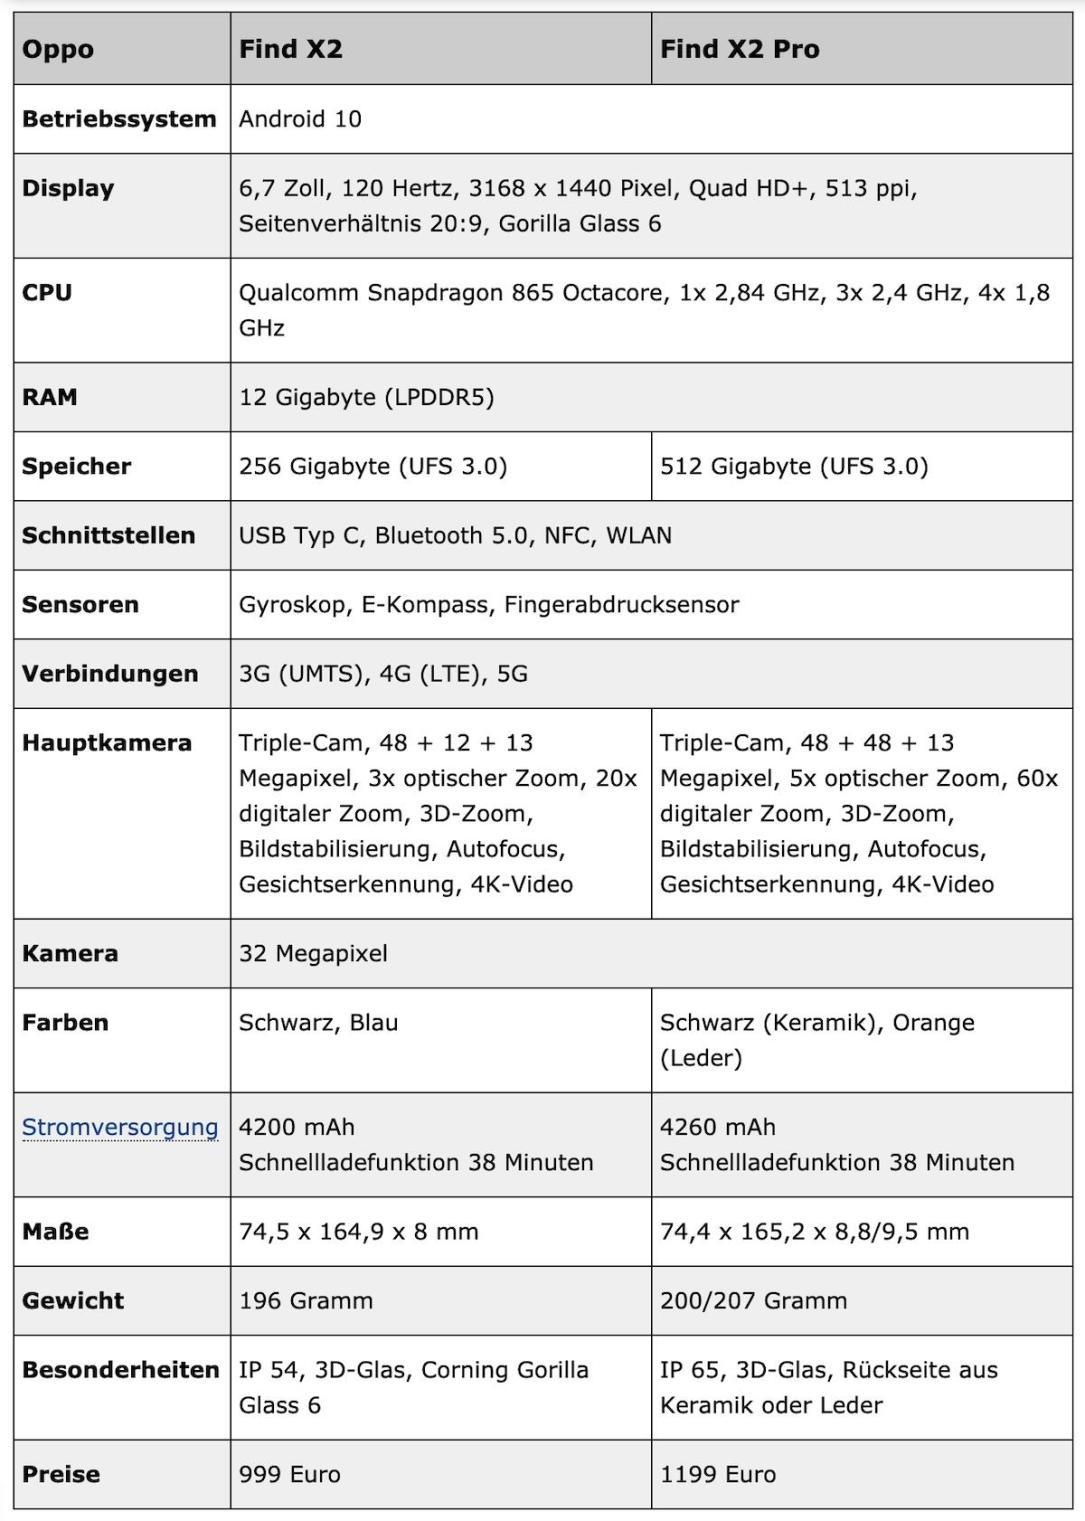 Oppo Find X2 Pro Spezifikationen